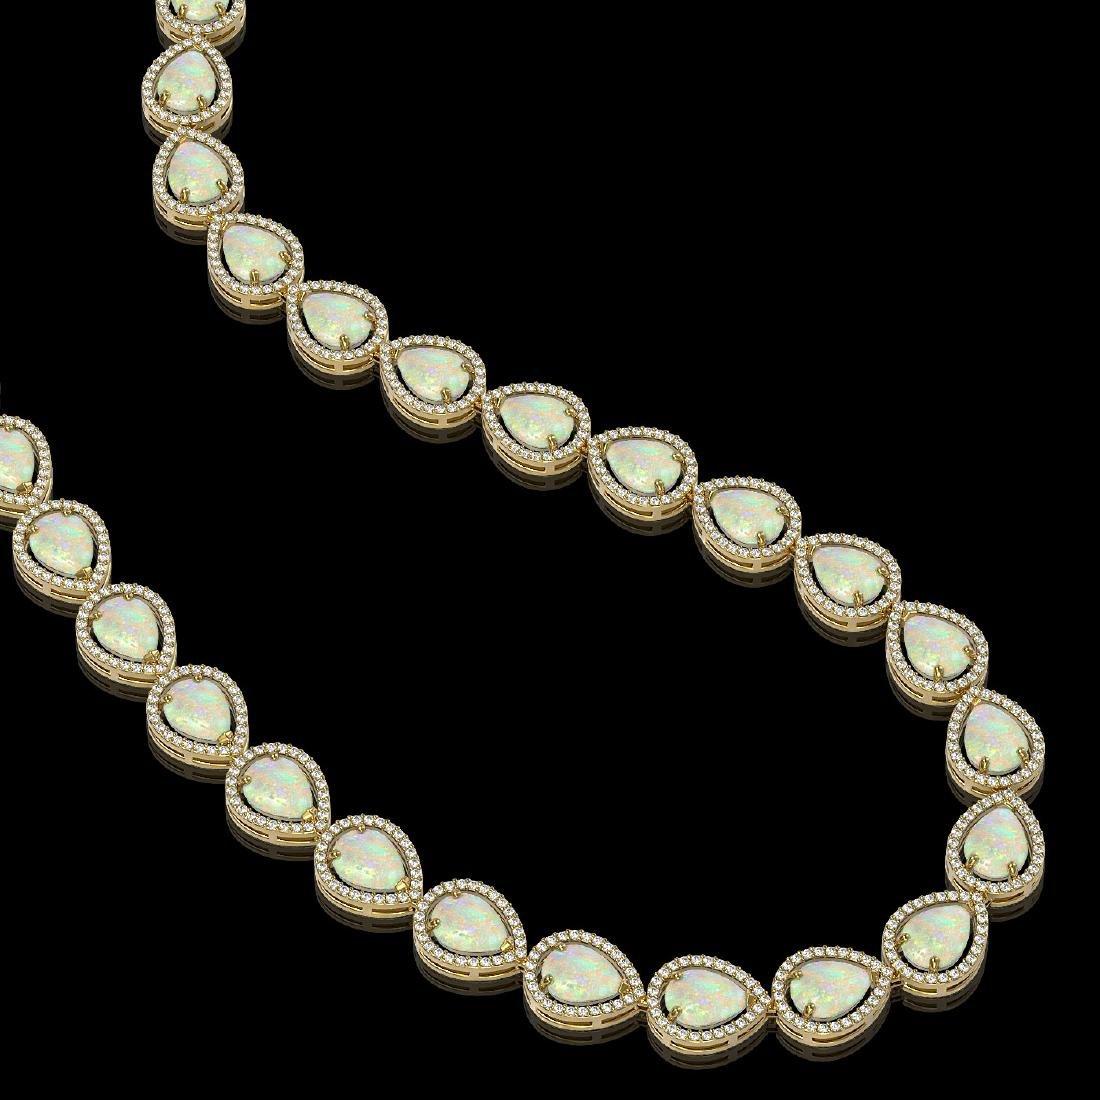 36.48 CTW Opal & Diamond Halo Necklace 10K Yellow Gold - 2